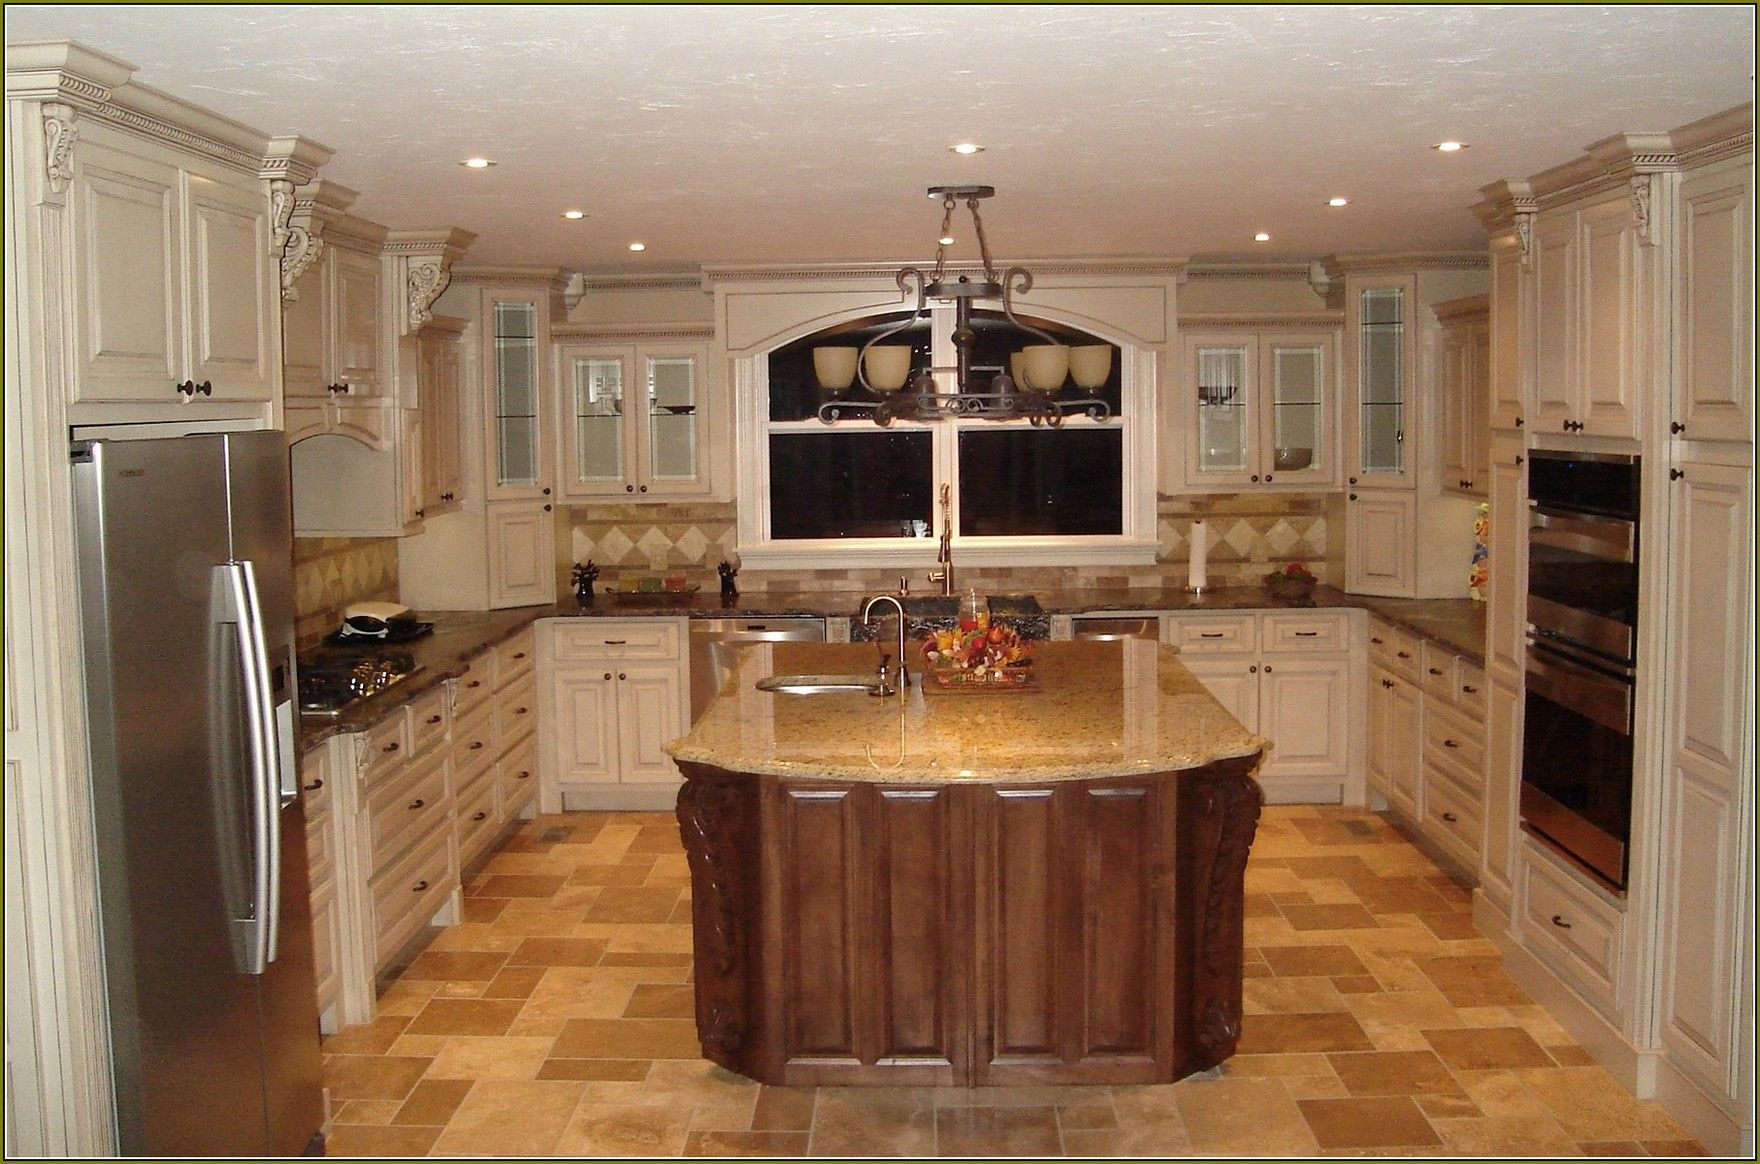 Antique Kitchen Design 27 Antique White Kitchen Cabinets Amazing Photos Gallery  Rustic